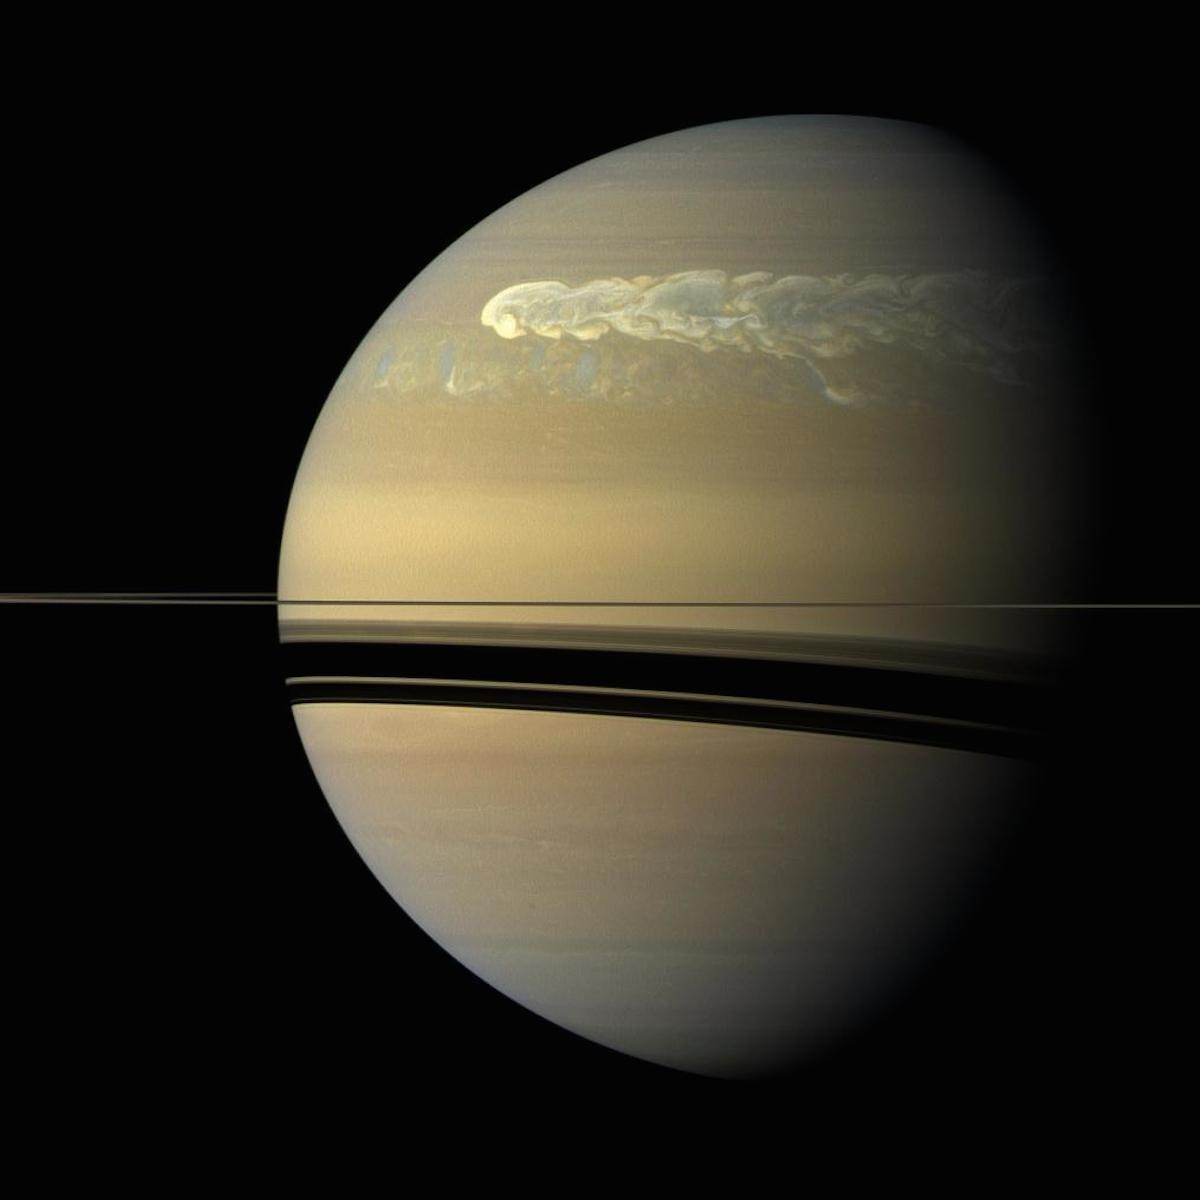 imagenes nunca vistas de saturno tomadas por la sonda cassini 8